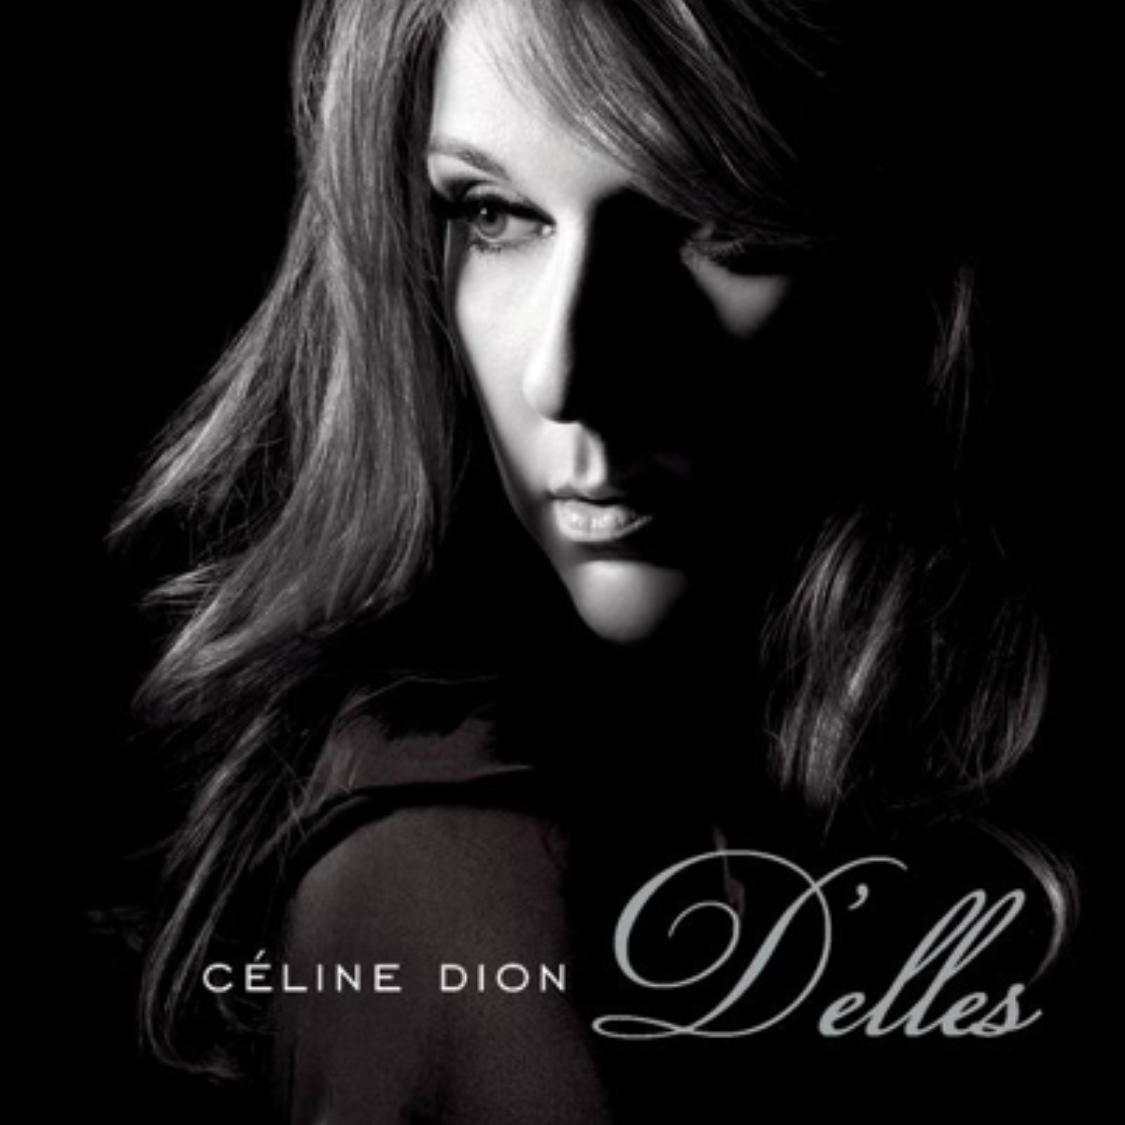 http://4.bp.blogspot.com/-Fj1uSTQHAIQ/T1OCsXn8iyI/AAAAAAAAEE4/1fTIKSeAXFg/s1600/Celine+Dion03.png